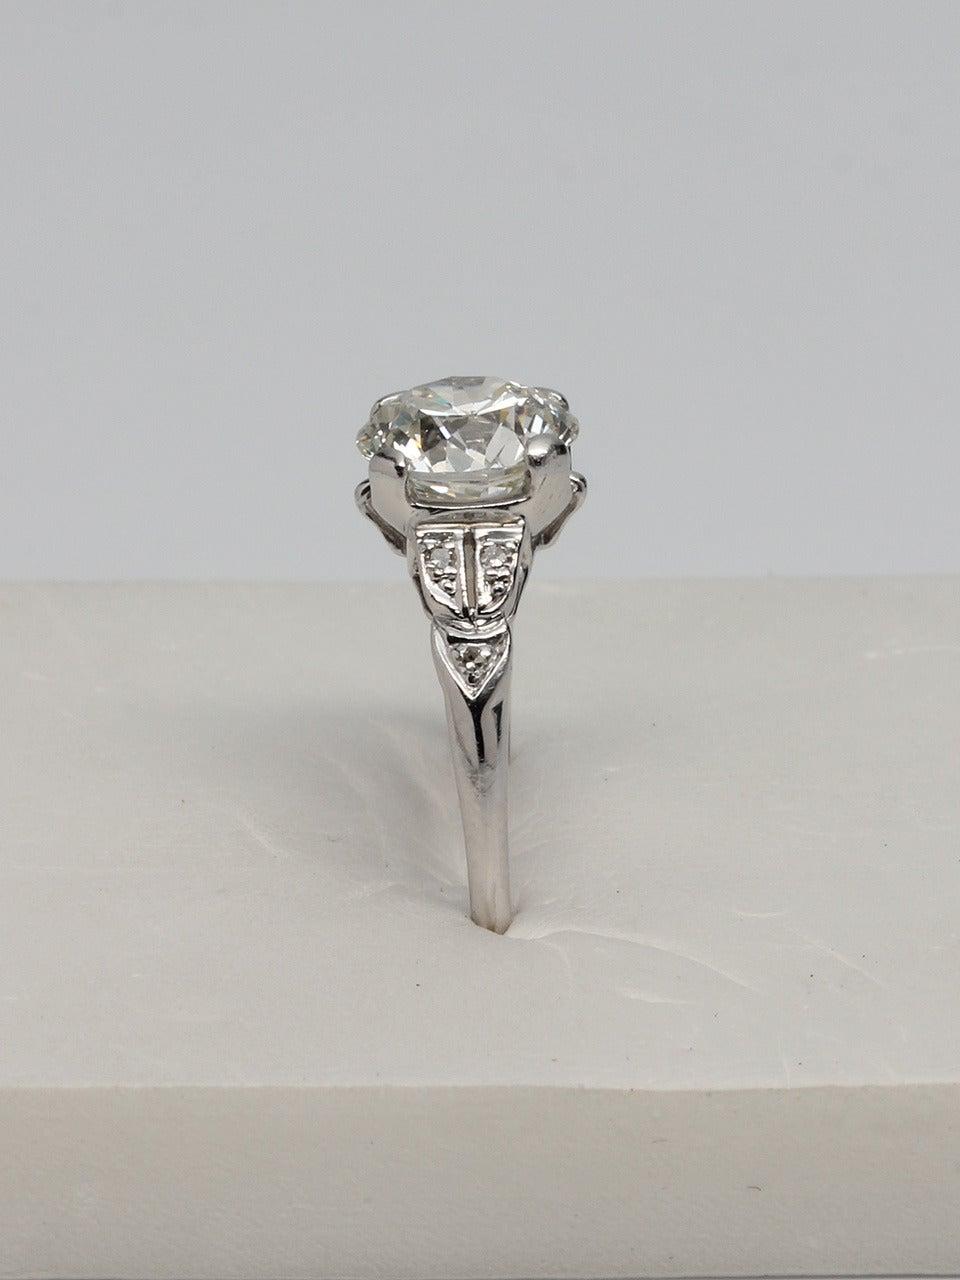 b212d373437bb Vintage Art Deco Diamond Engagement Ring Platinum 2.05 Carat I/VS2, circa  1930s